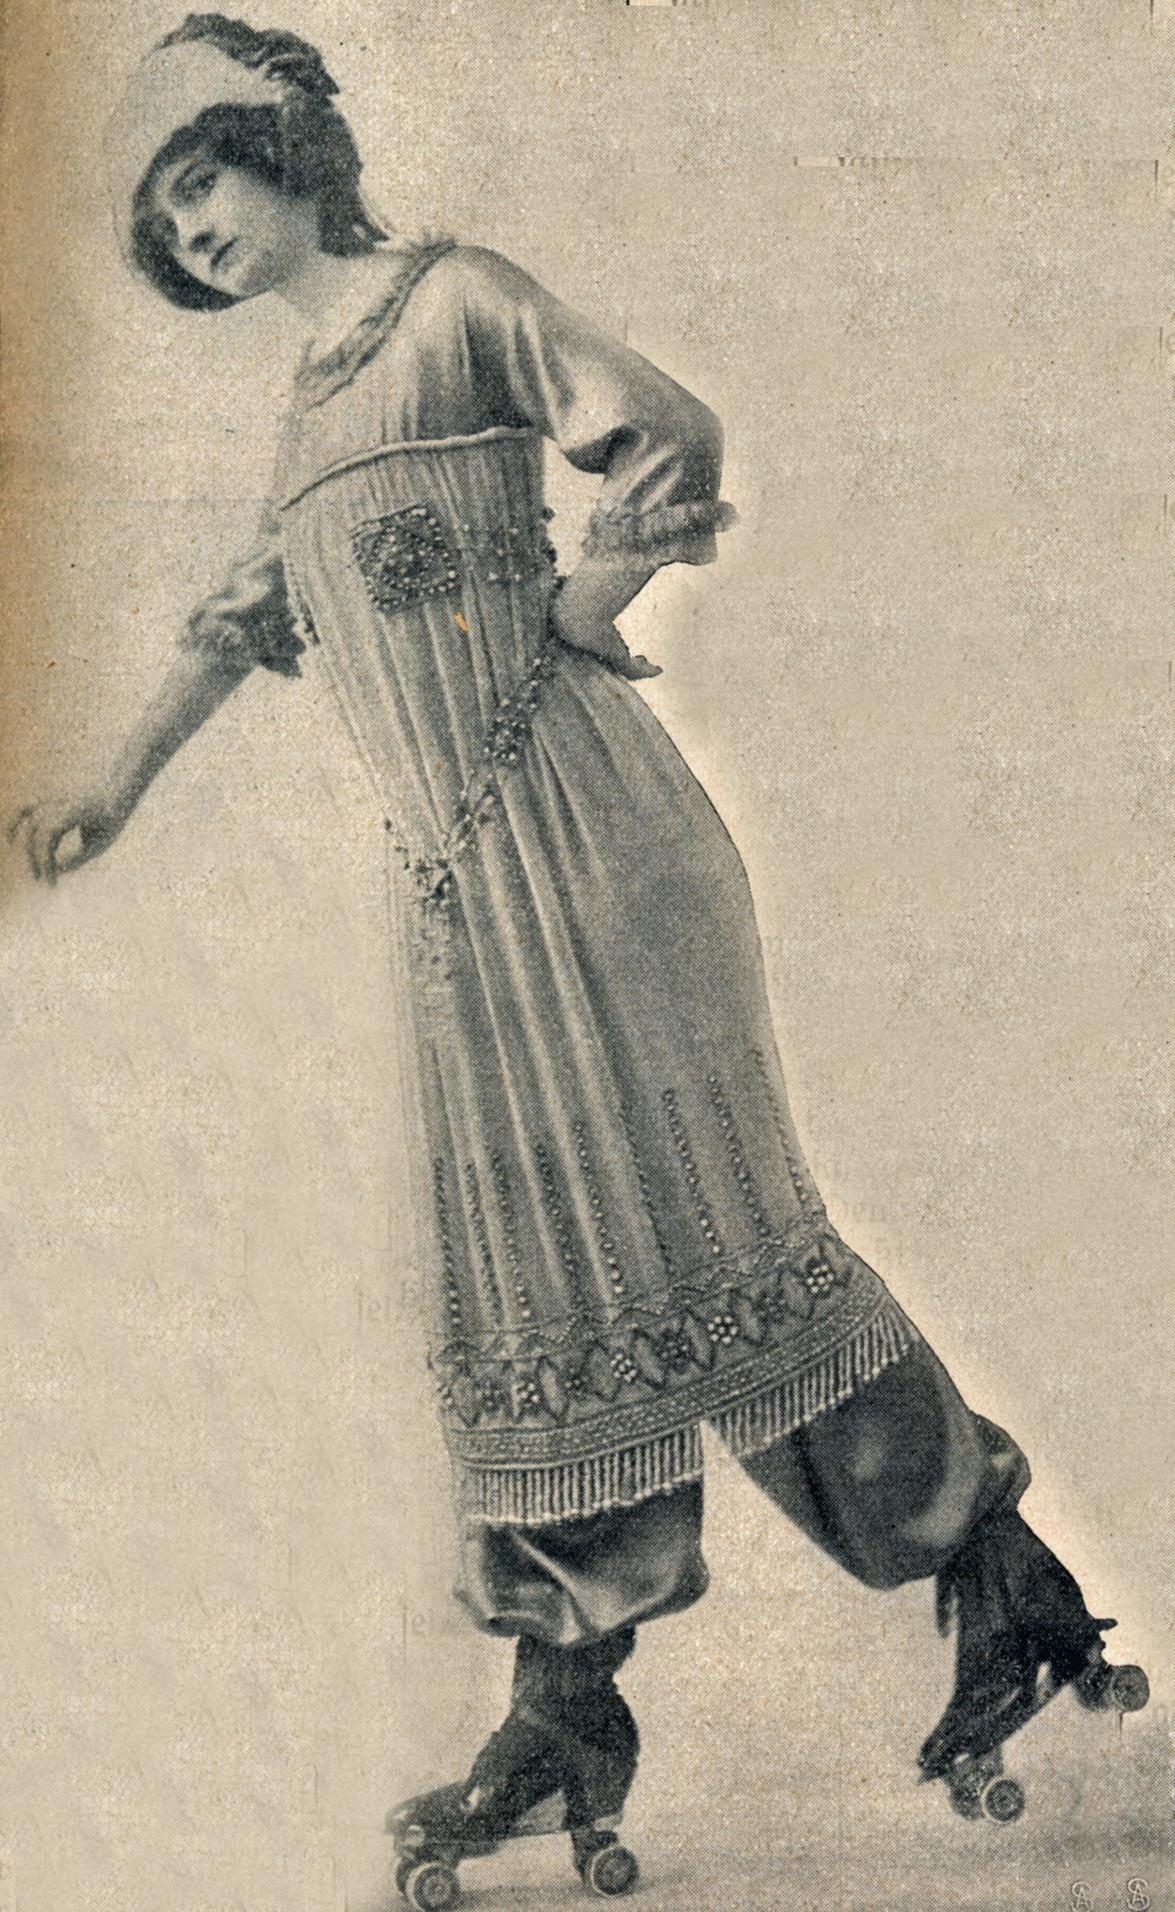 die-woche-1911-1.-nr.15-s.633-sportkostuem